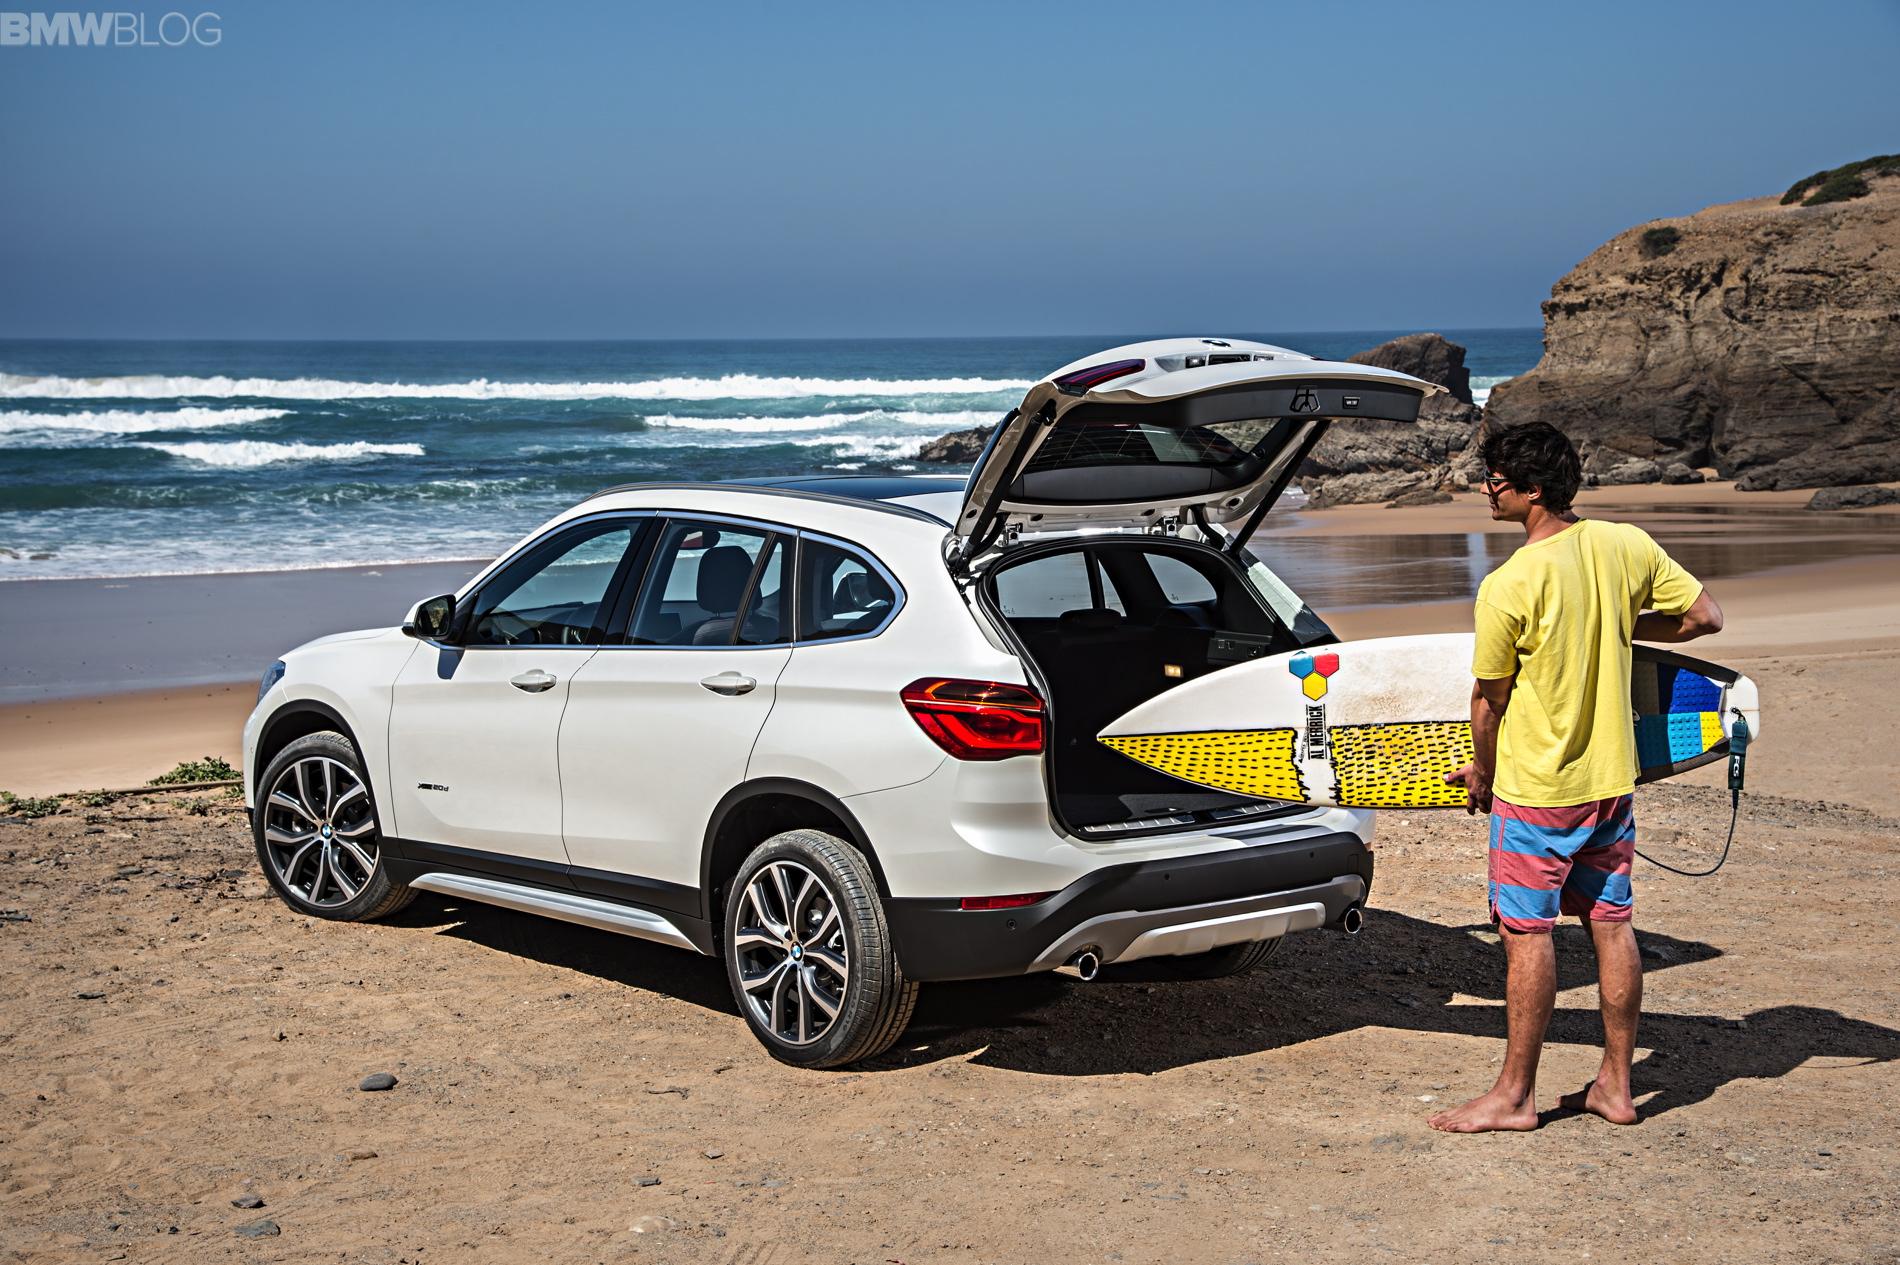 2016 BMW X1 exterior 1900x1200 images 24